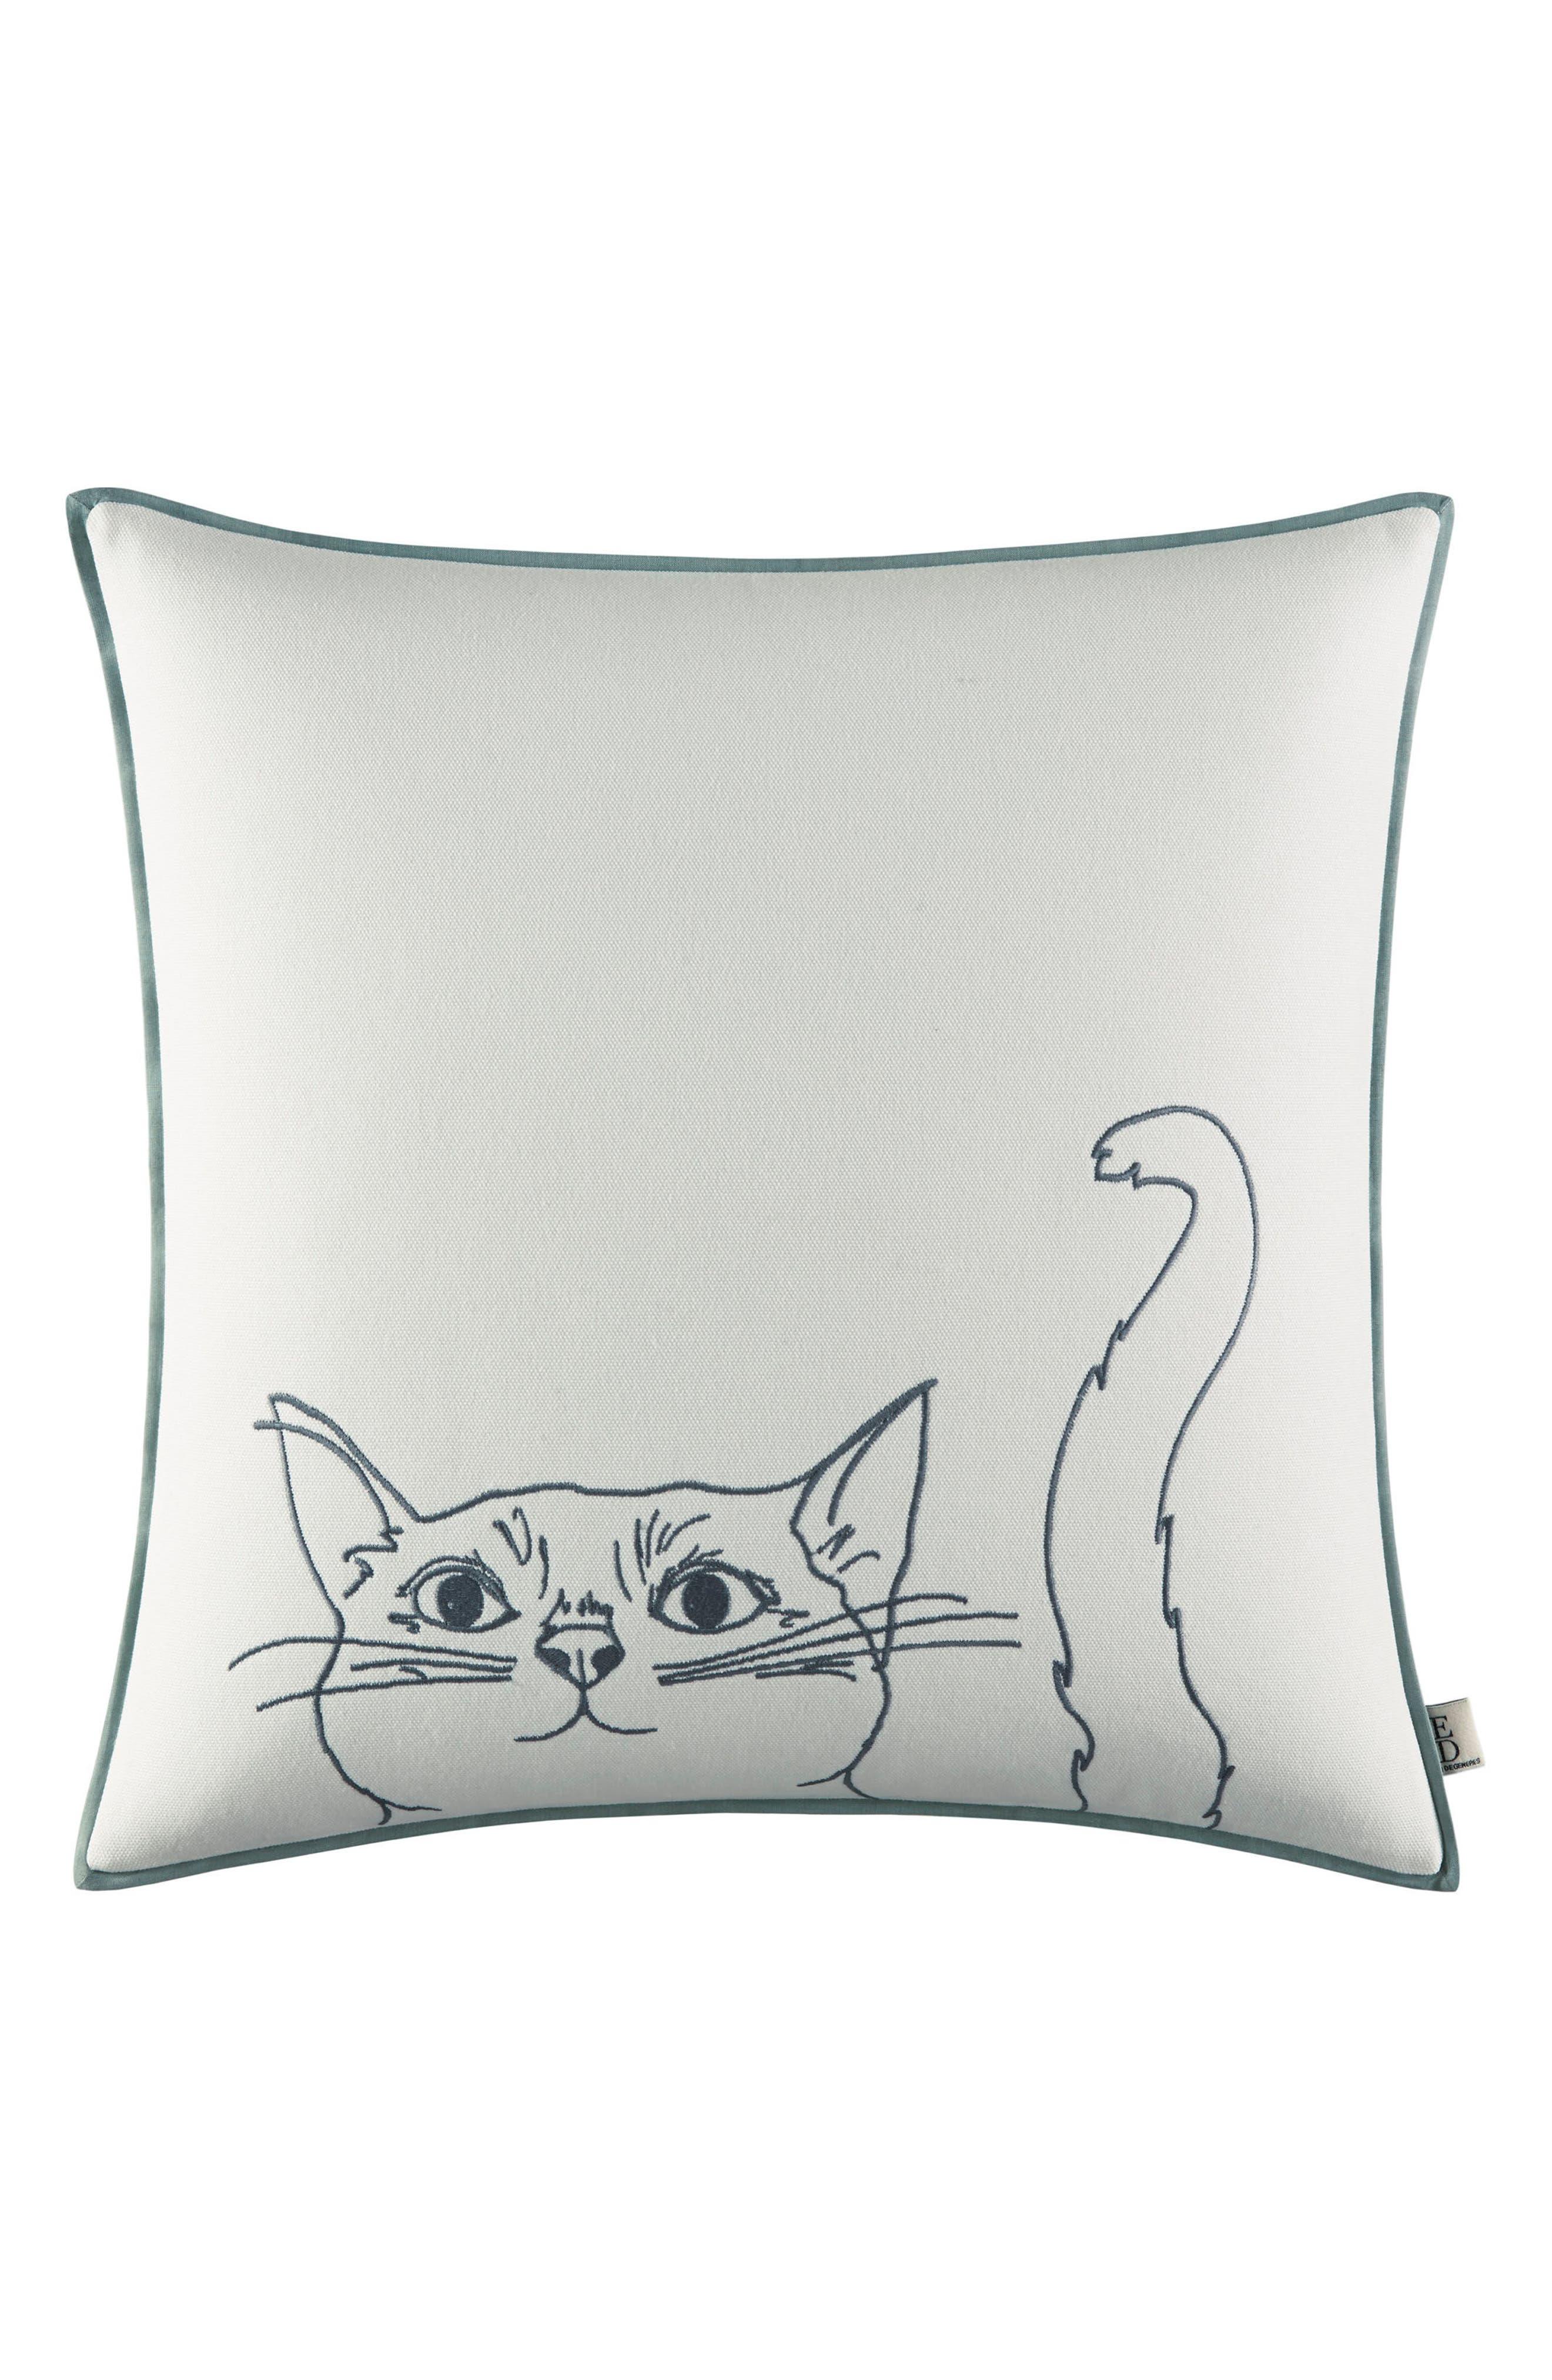 Cat Pillow,                         Main,                         color, White